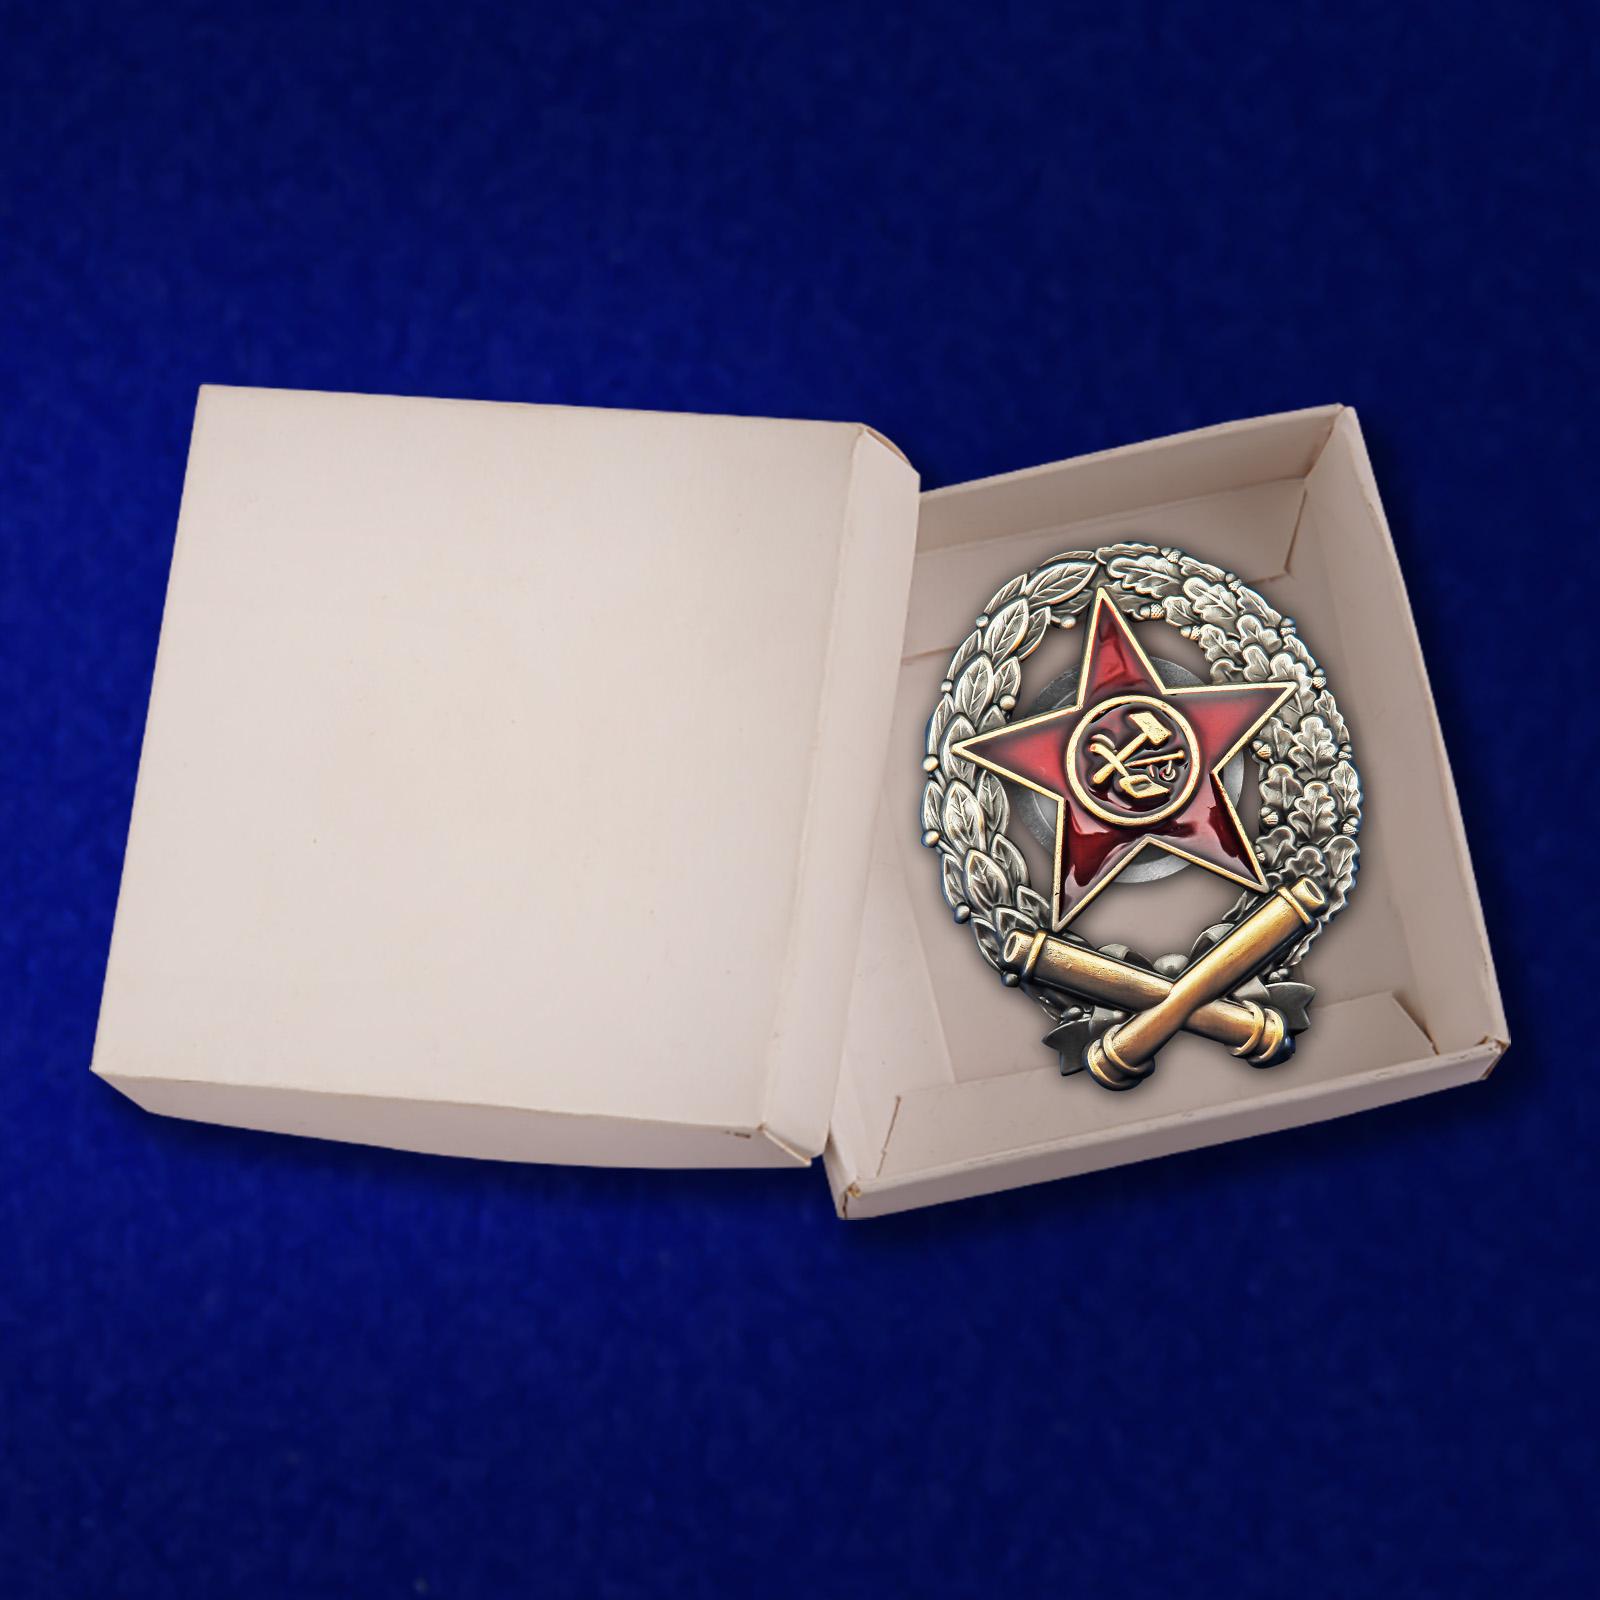 Знак Красного командира-артиллериста - с доставкой